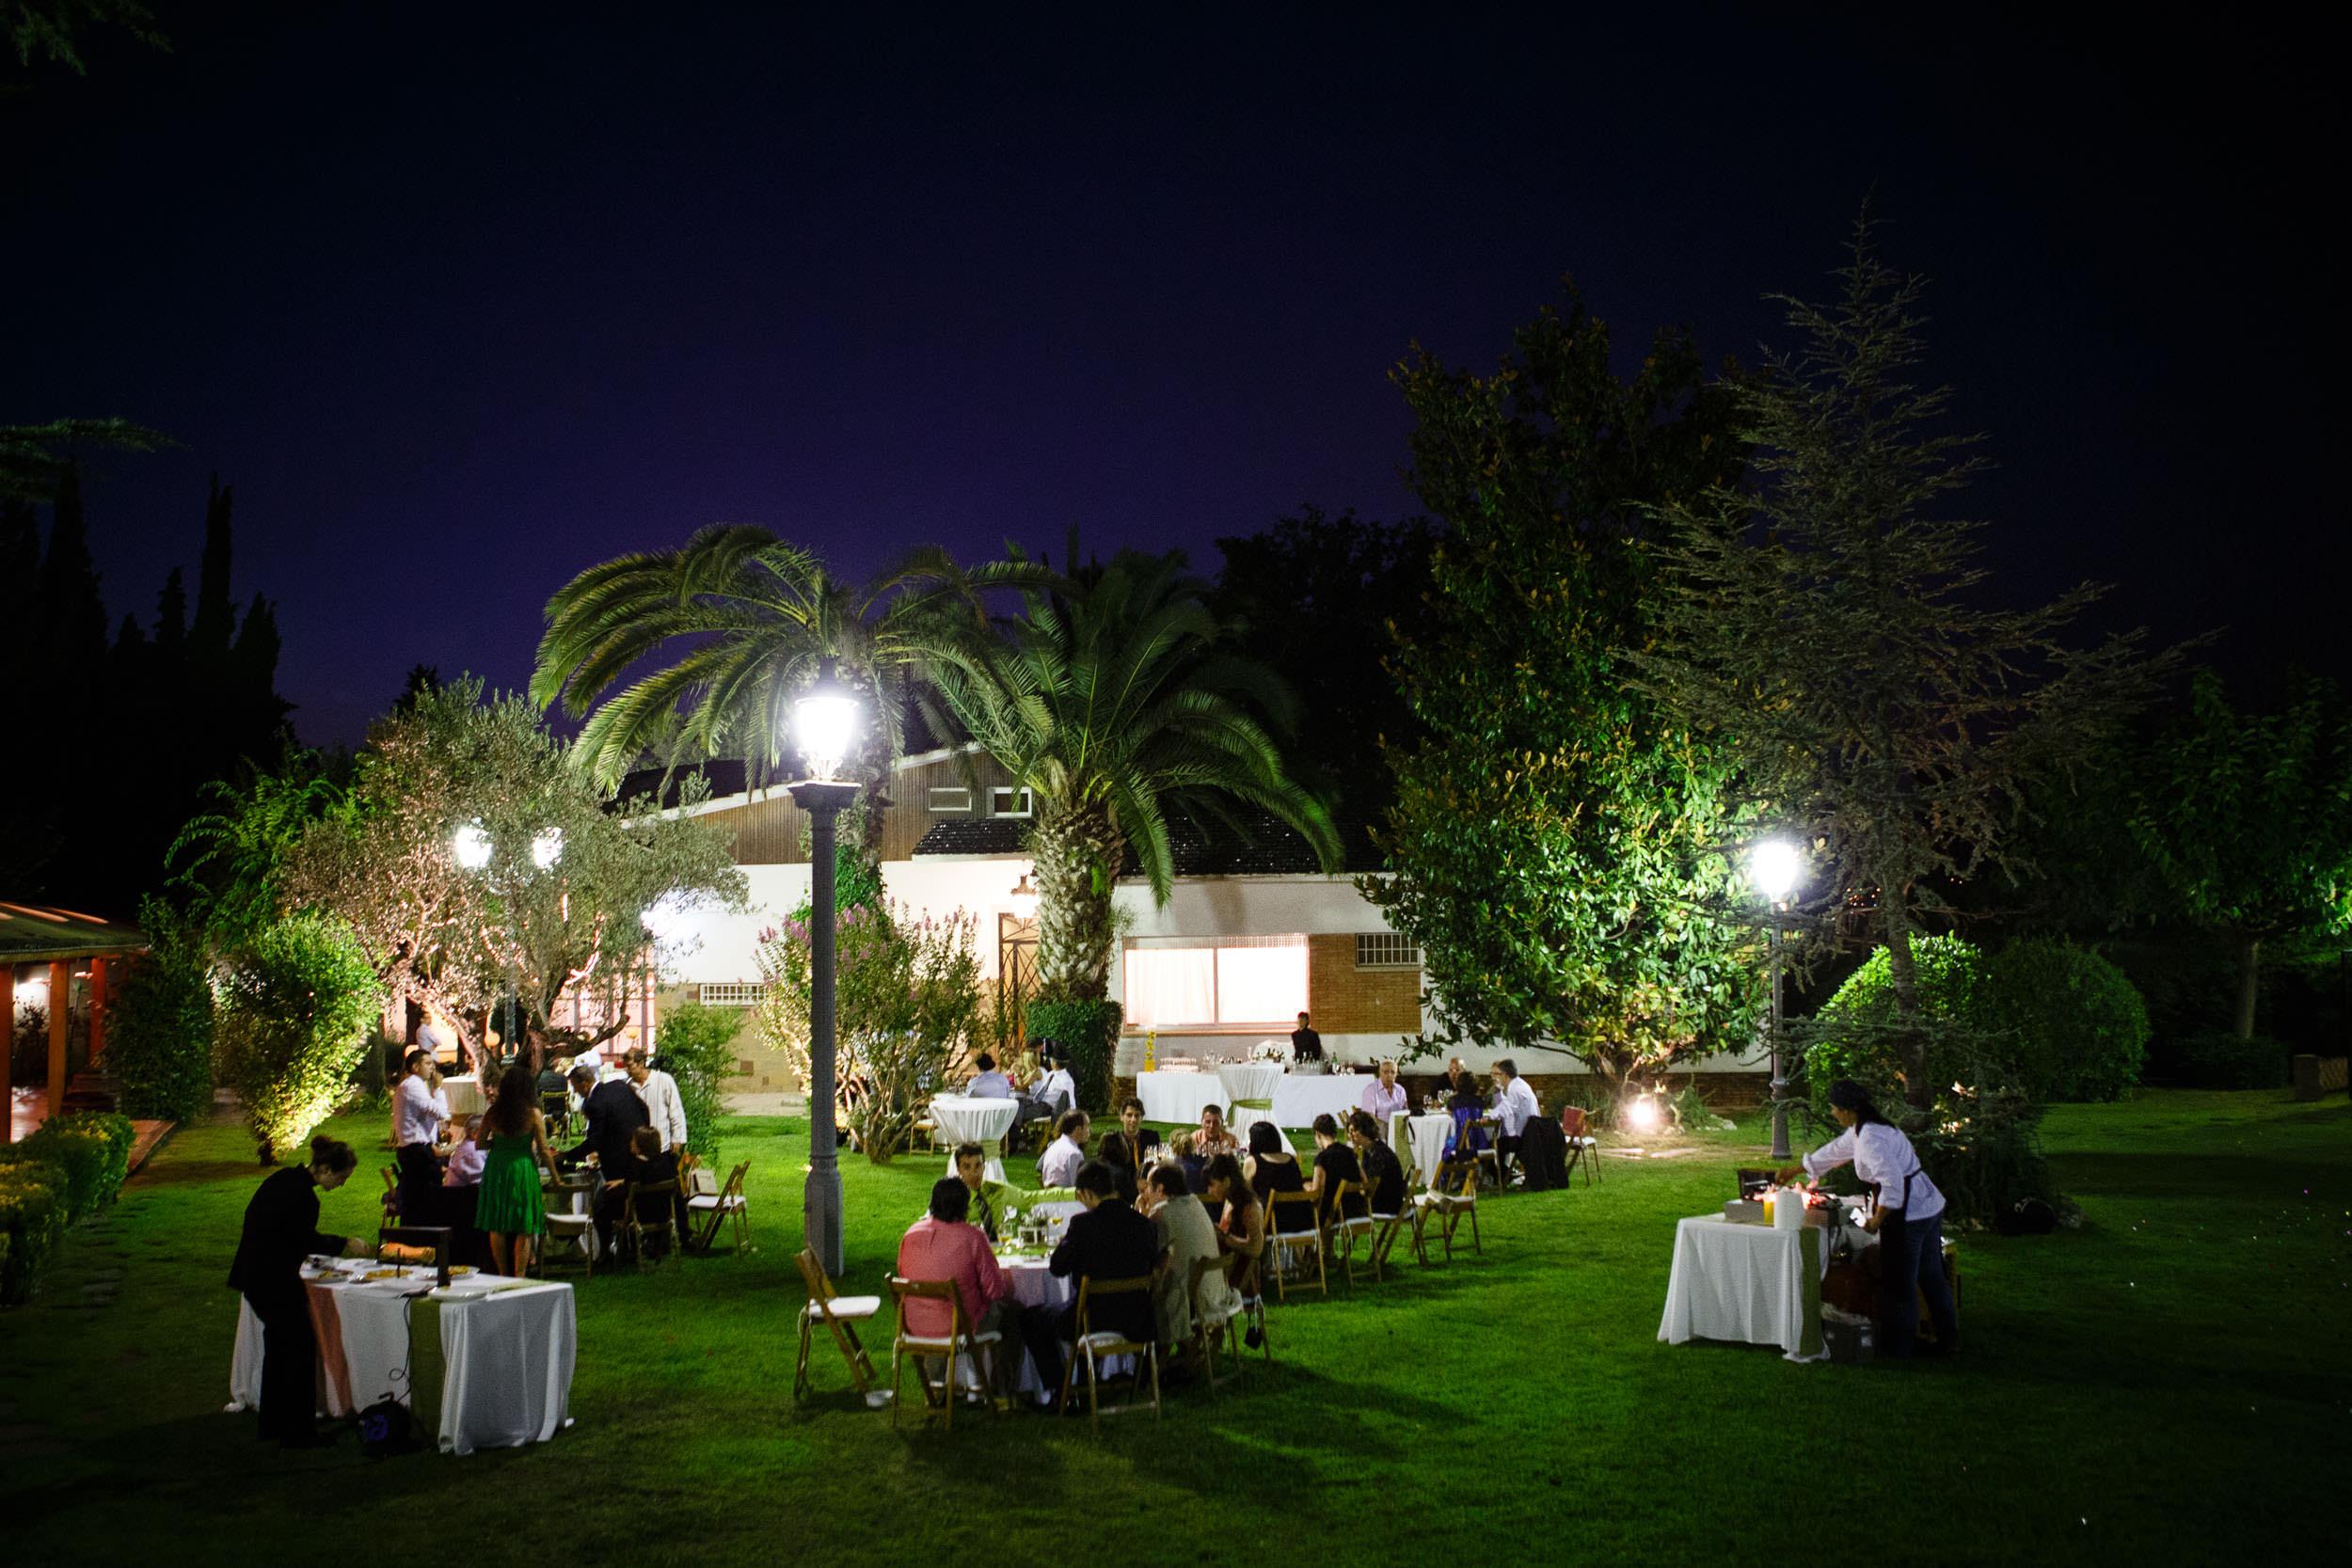 Destination Wedding   Vil.la Sabat Sant Cugat del Valles Barcelona Catalonia Spain - James Sturcke  Photographer   sturcke.org_011.jpg